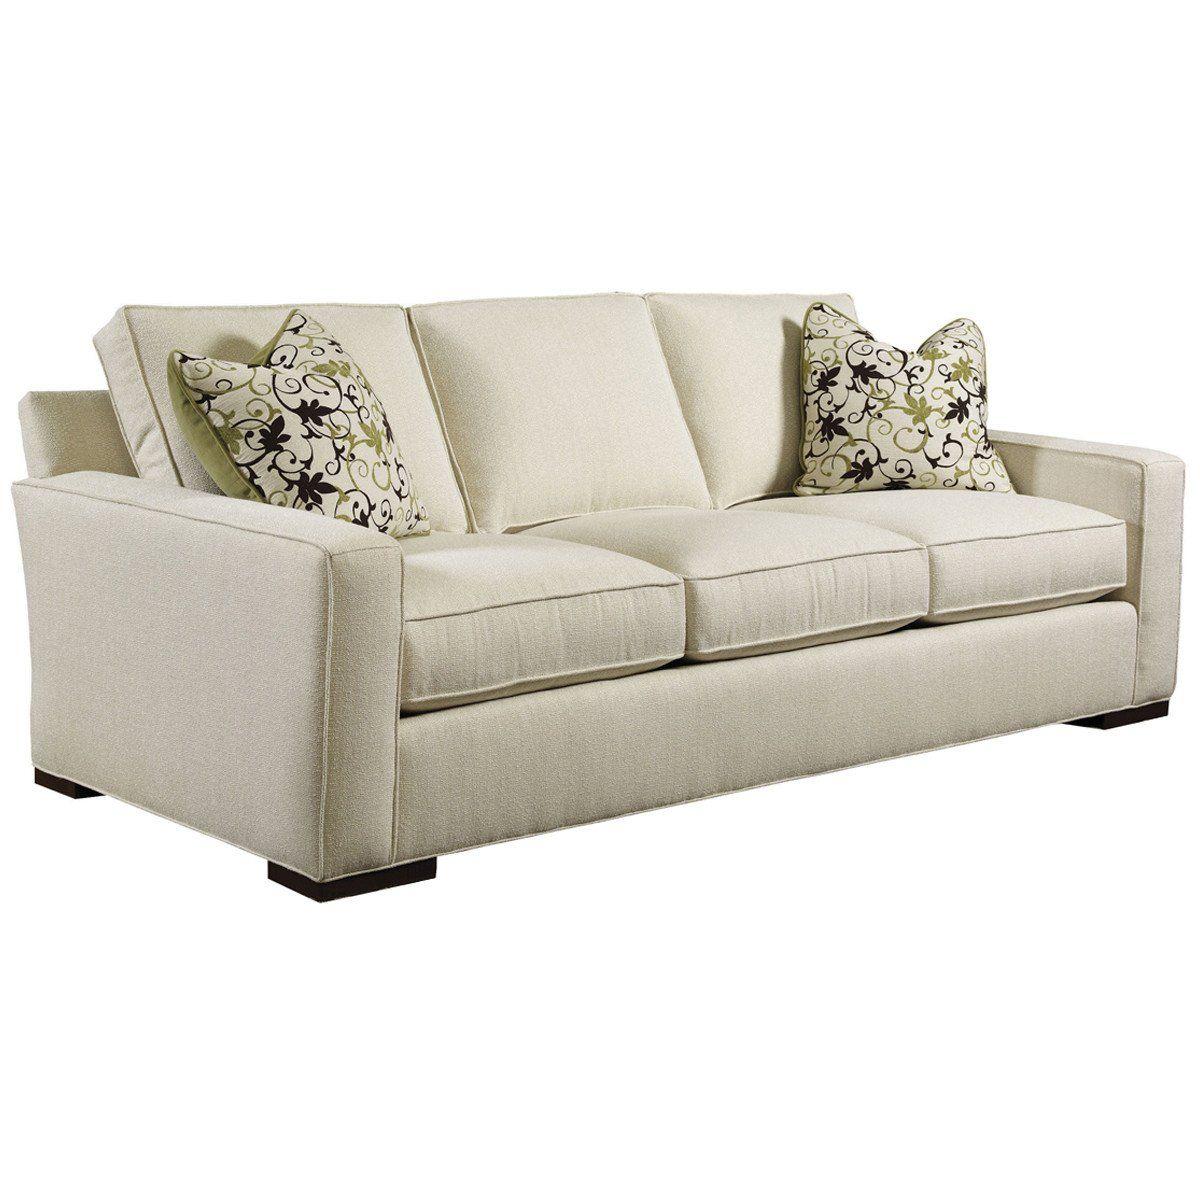 Lexington Upholstery Bond Sofa